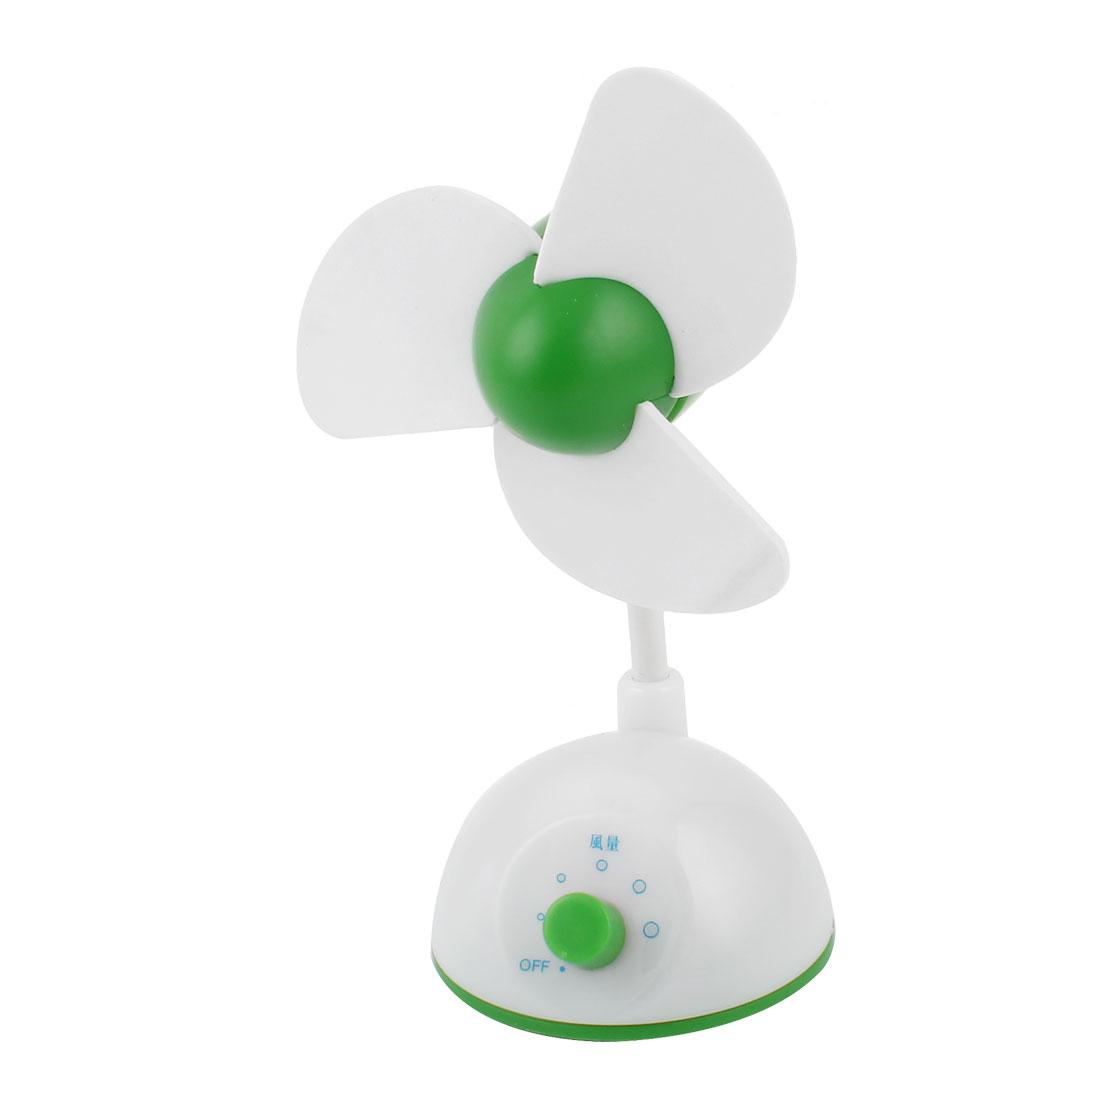 USB Powered Adjustable Wind Speed 3 Fan Flabellum Cooling Fan Green White